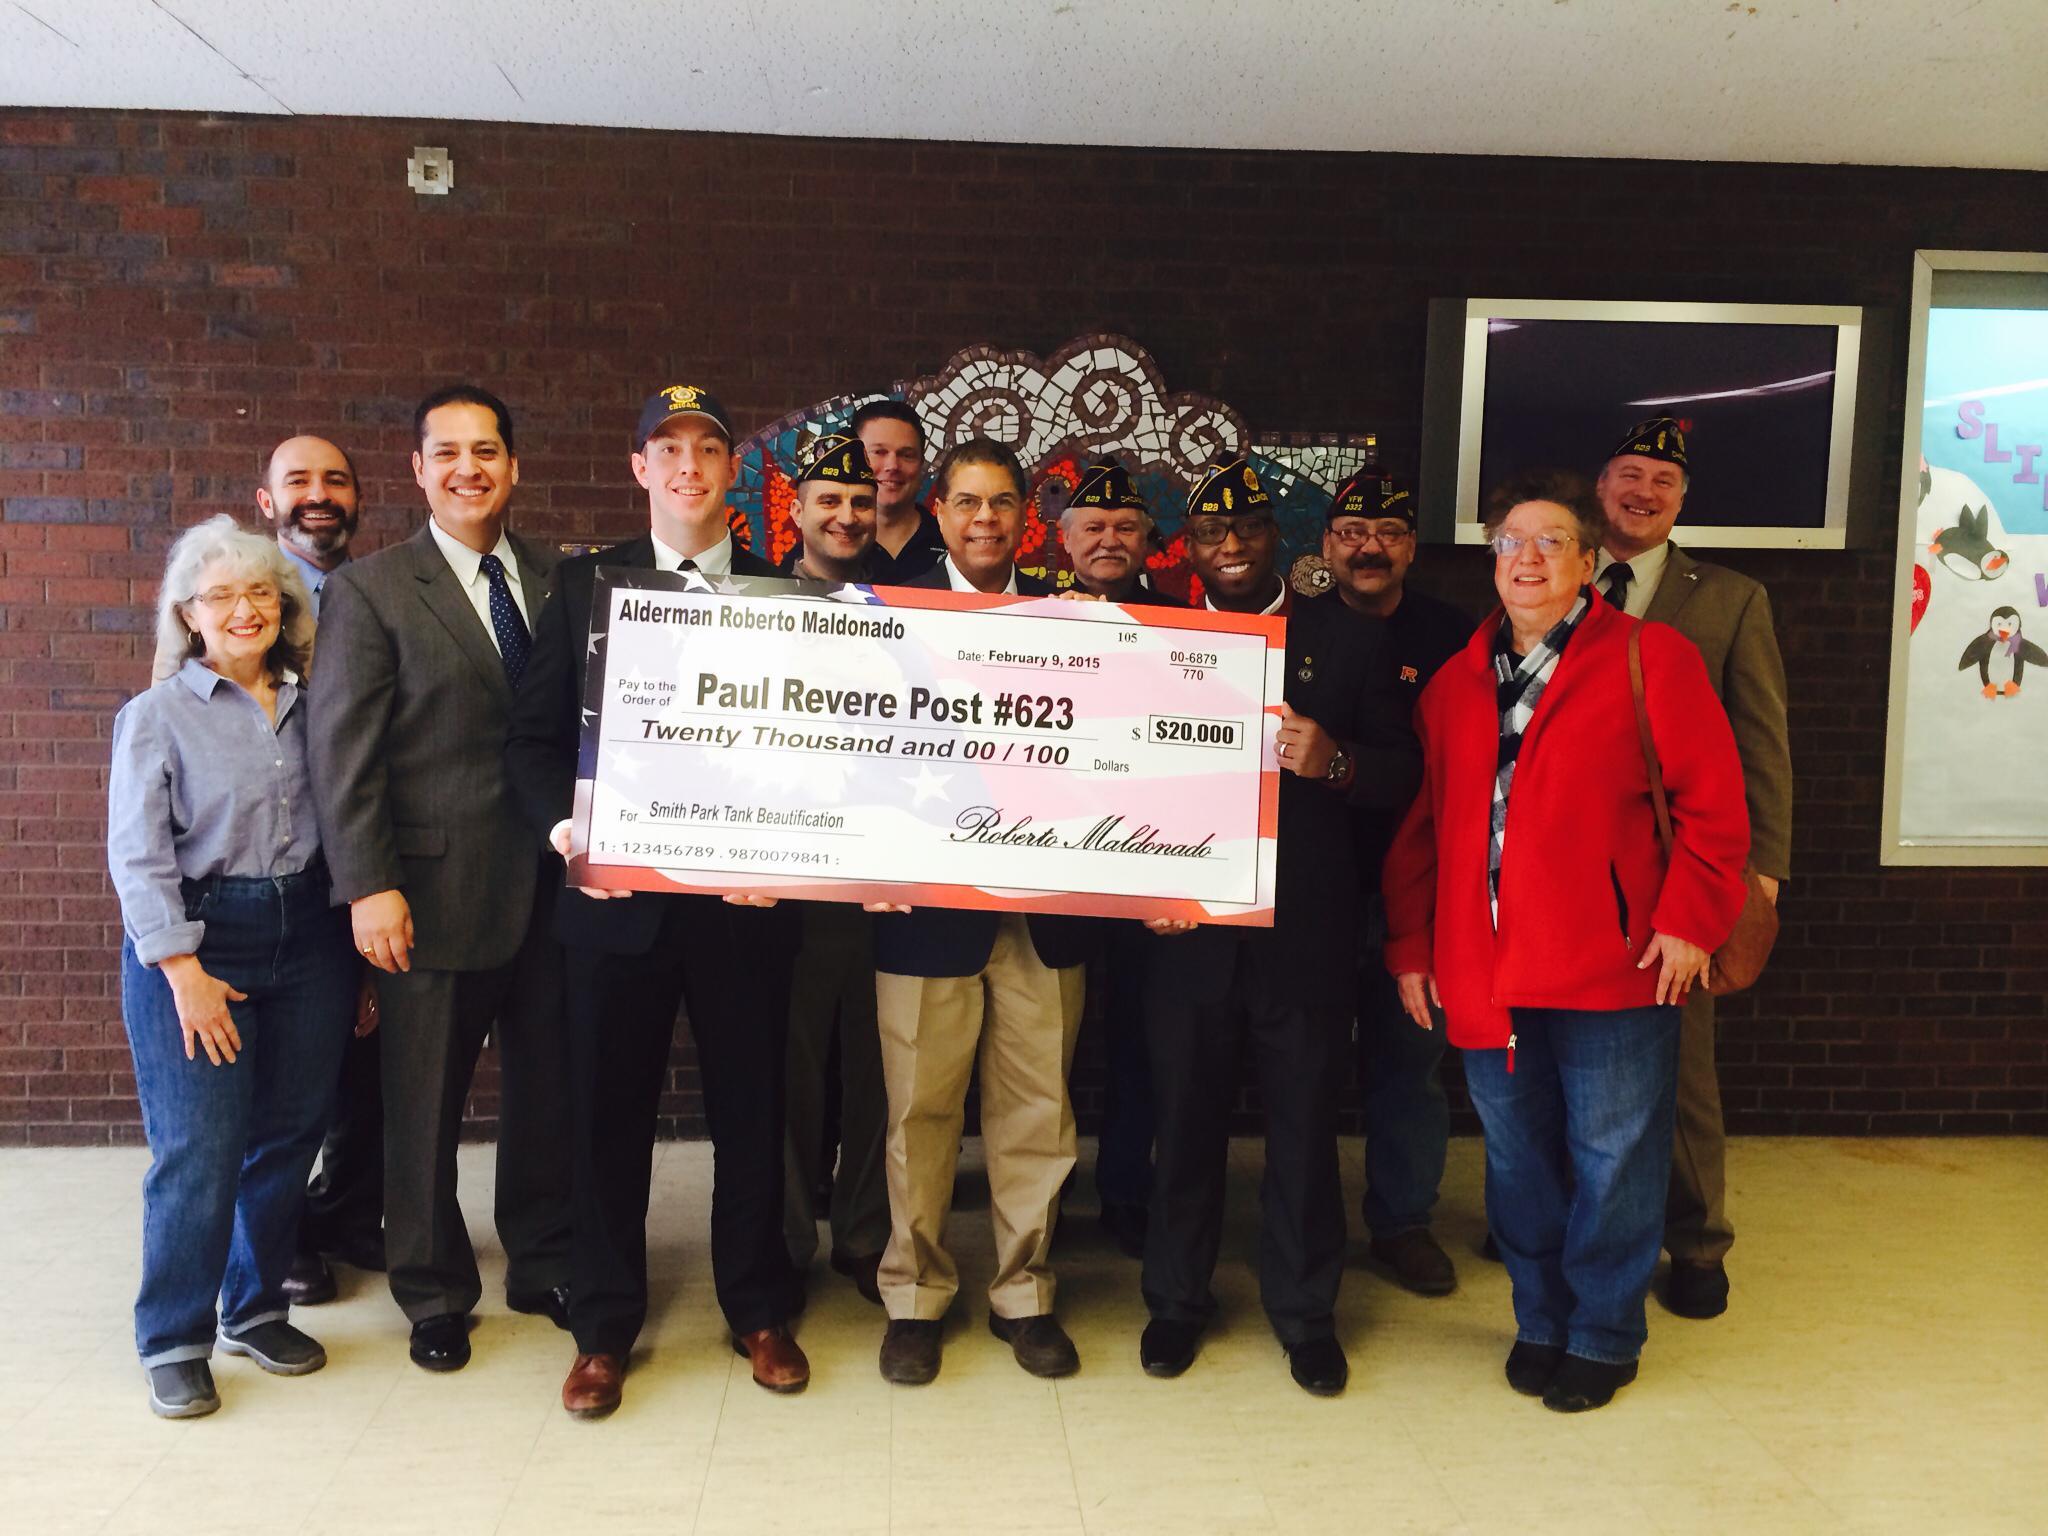 Smith Park and the American Legion Post Paul Revere # 623 receives $20,000 from Alderman Roberto Maldonado